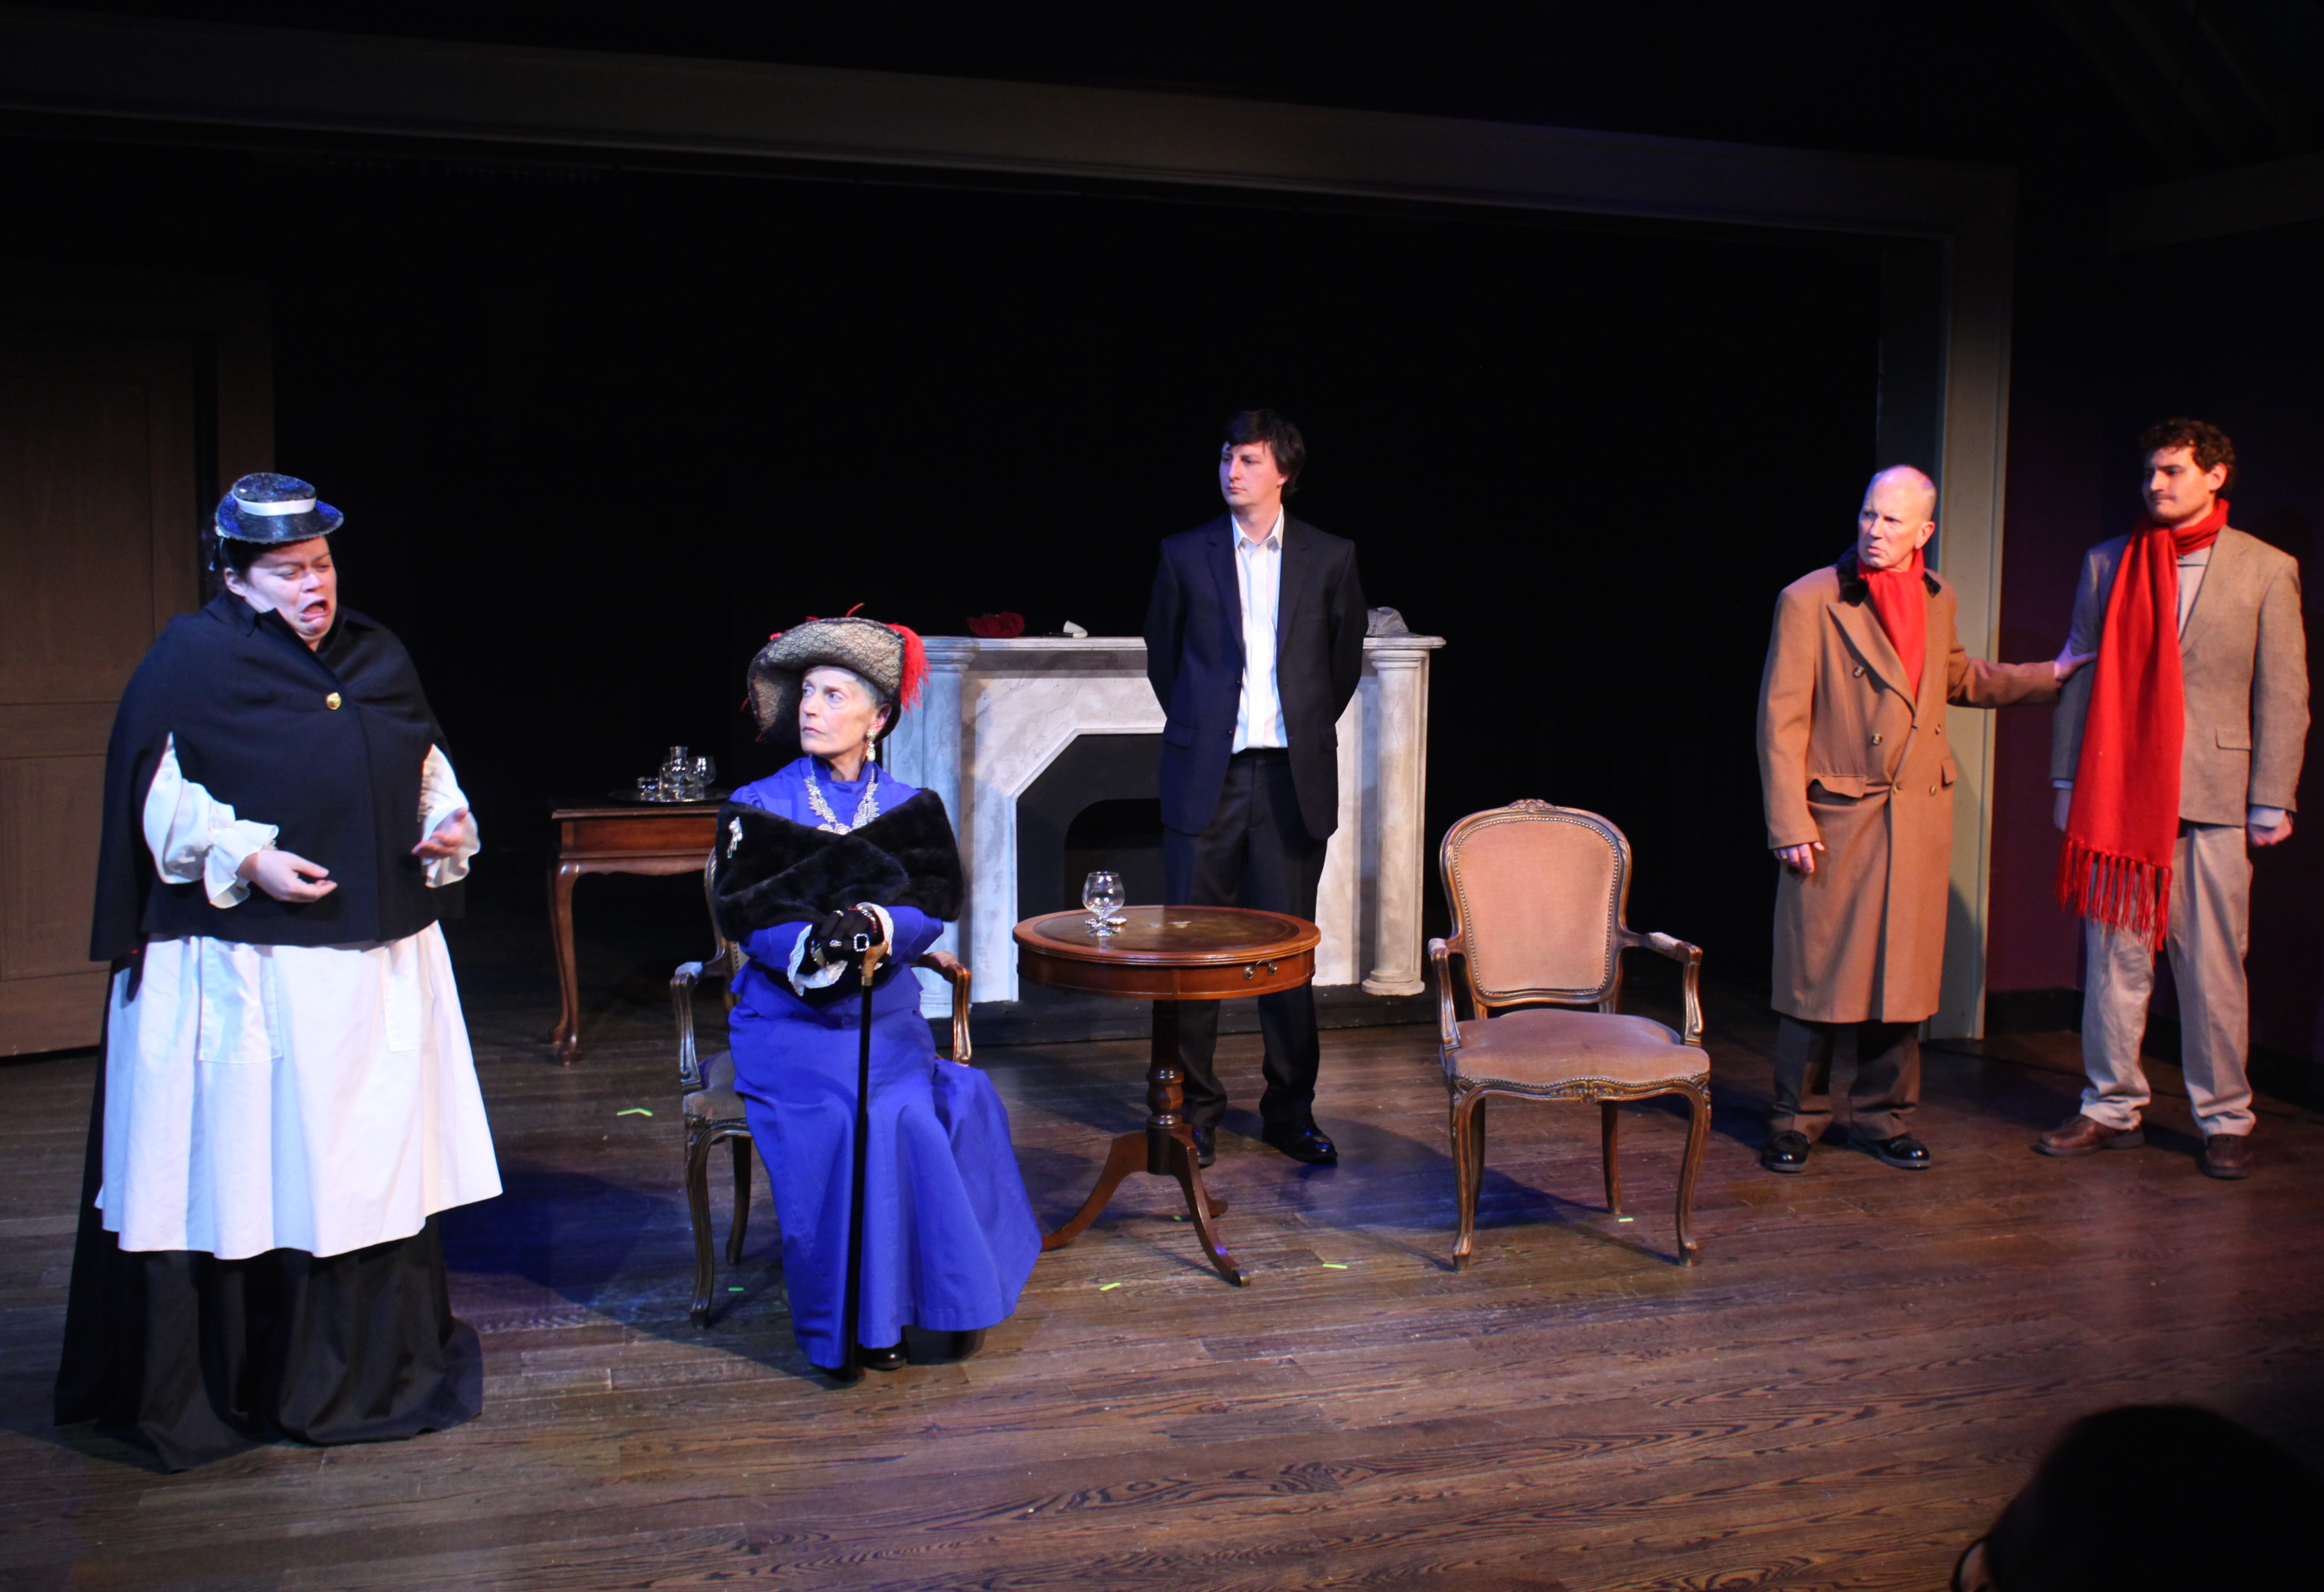 Betsy tell all - Betsy (Anne Vandersook), The Countess (Laura Cox), Sherlock Holmes (Matt Sims), Dr Watson (Paul Noga), and Robins (Samuel Pollin)